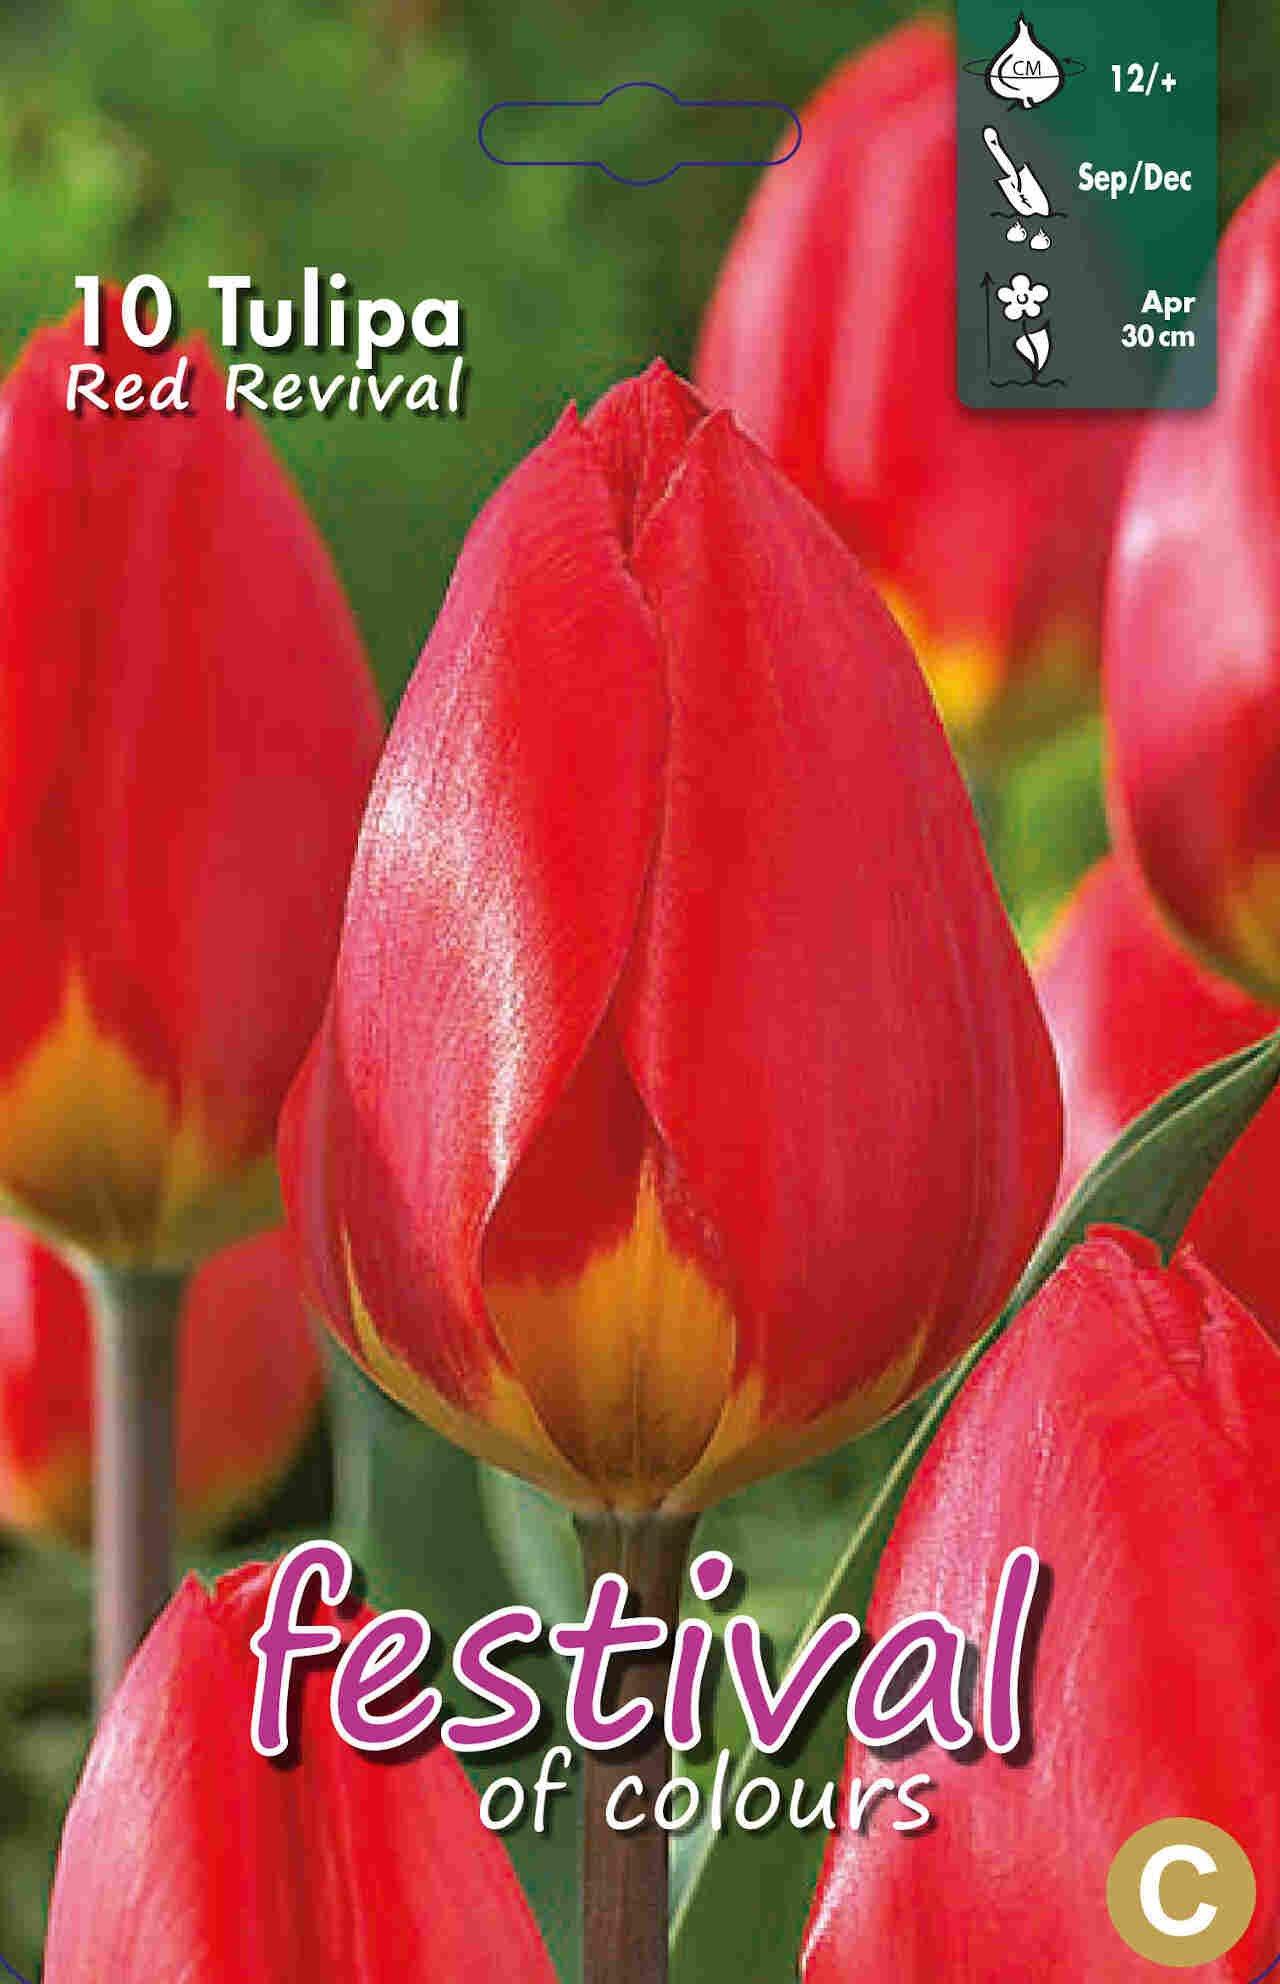 Tulipanløg - Tulipa Red Revival 12/+